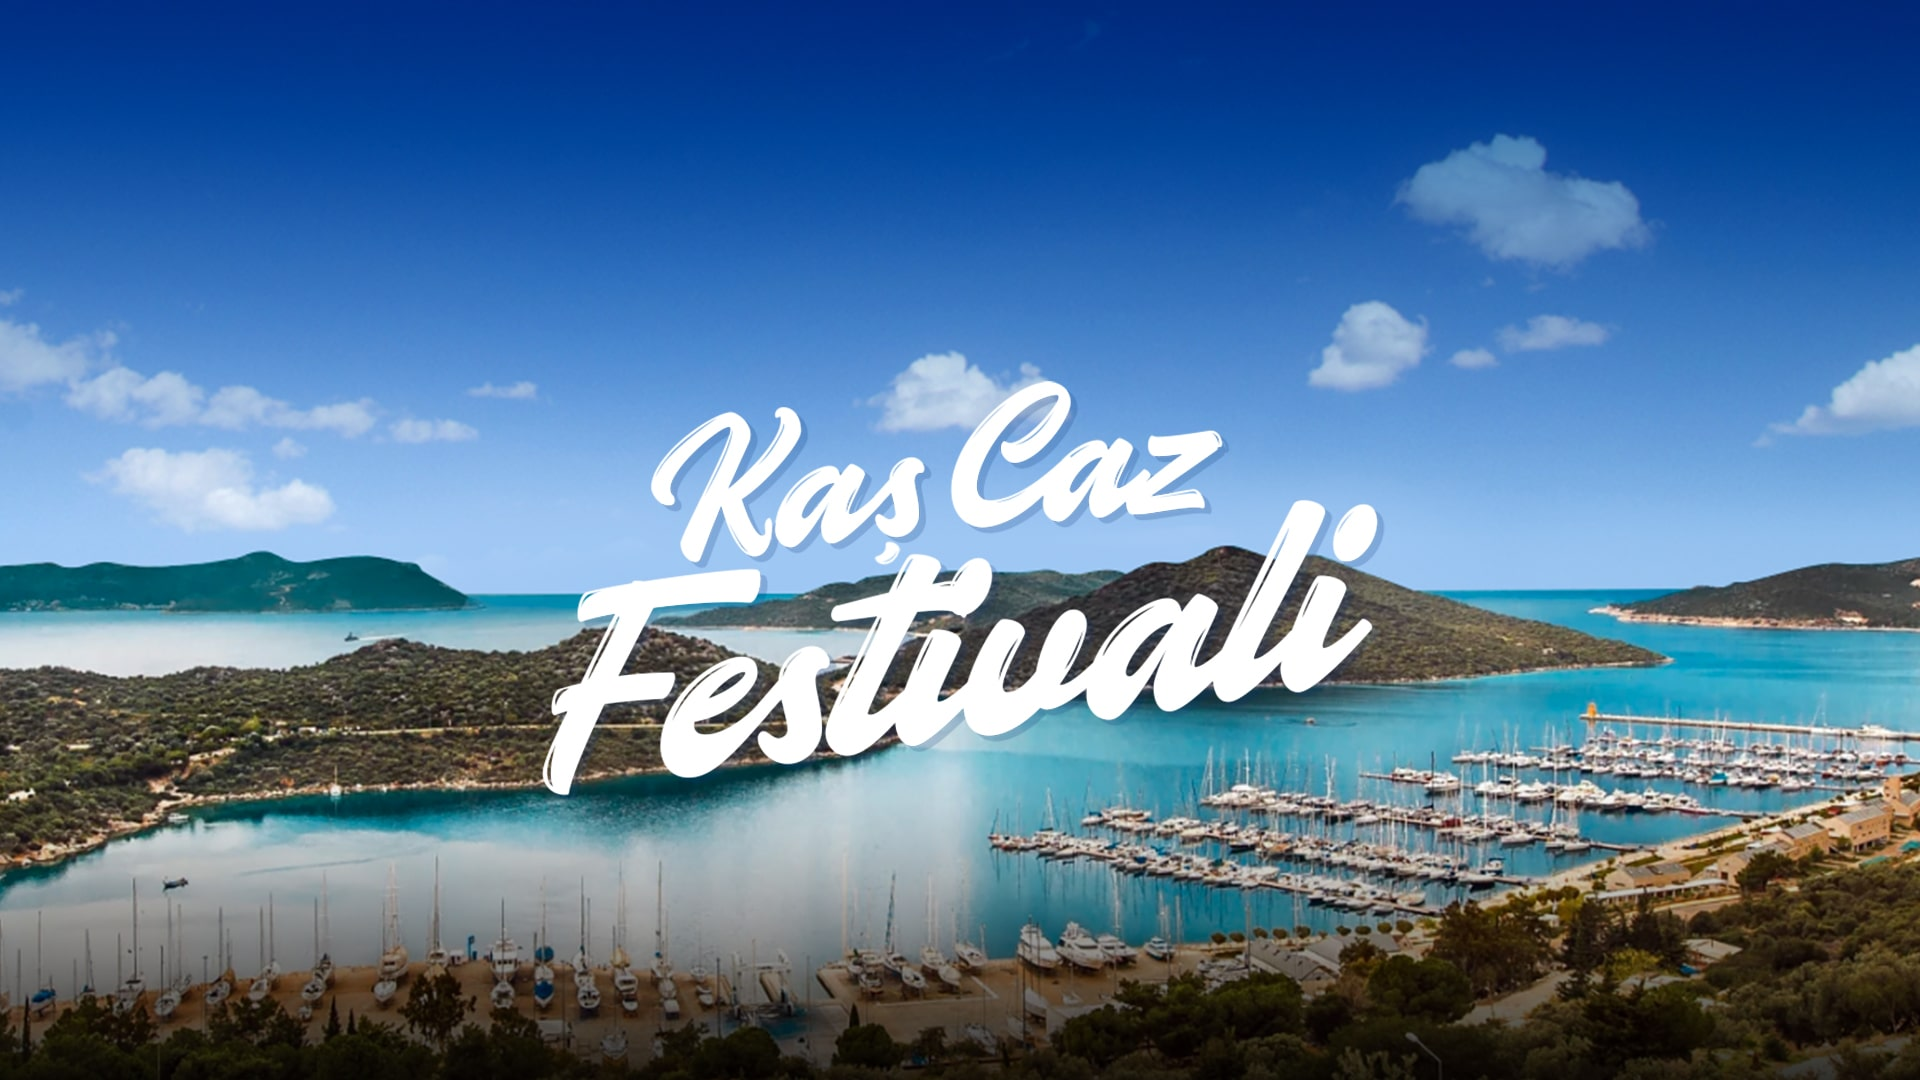 Kas-caz-festivali